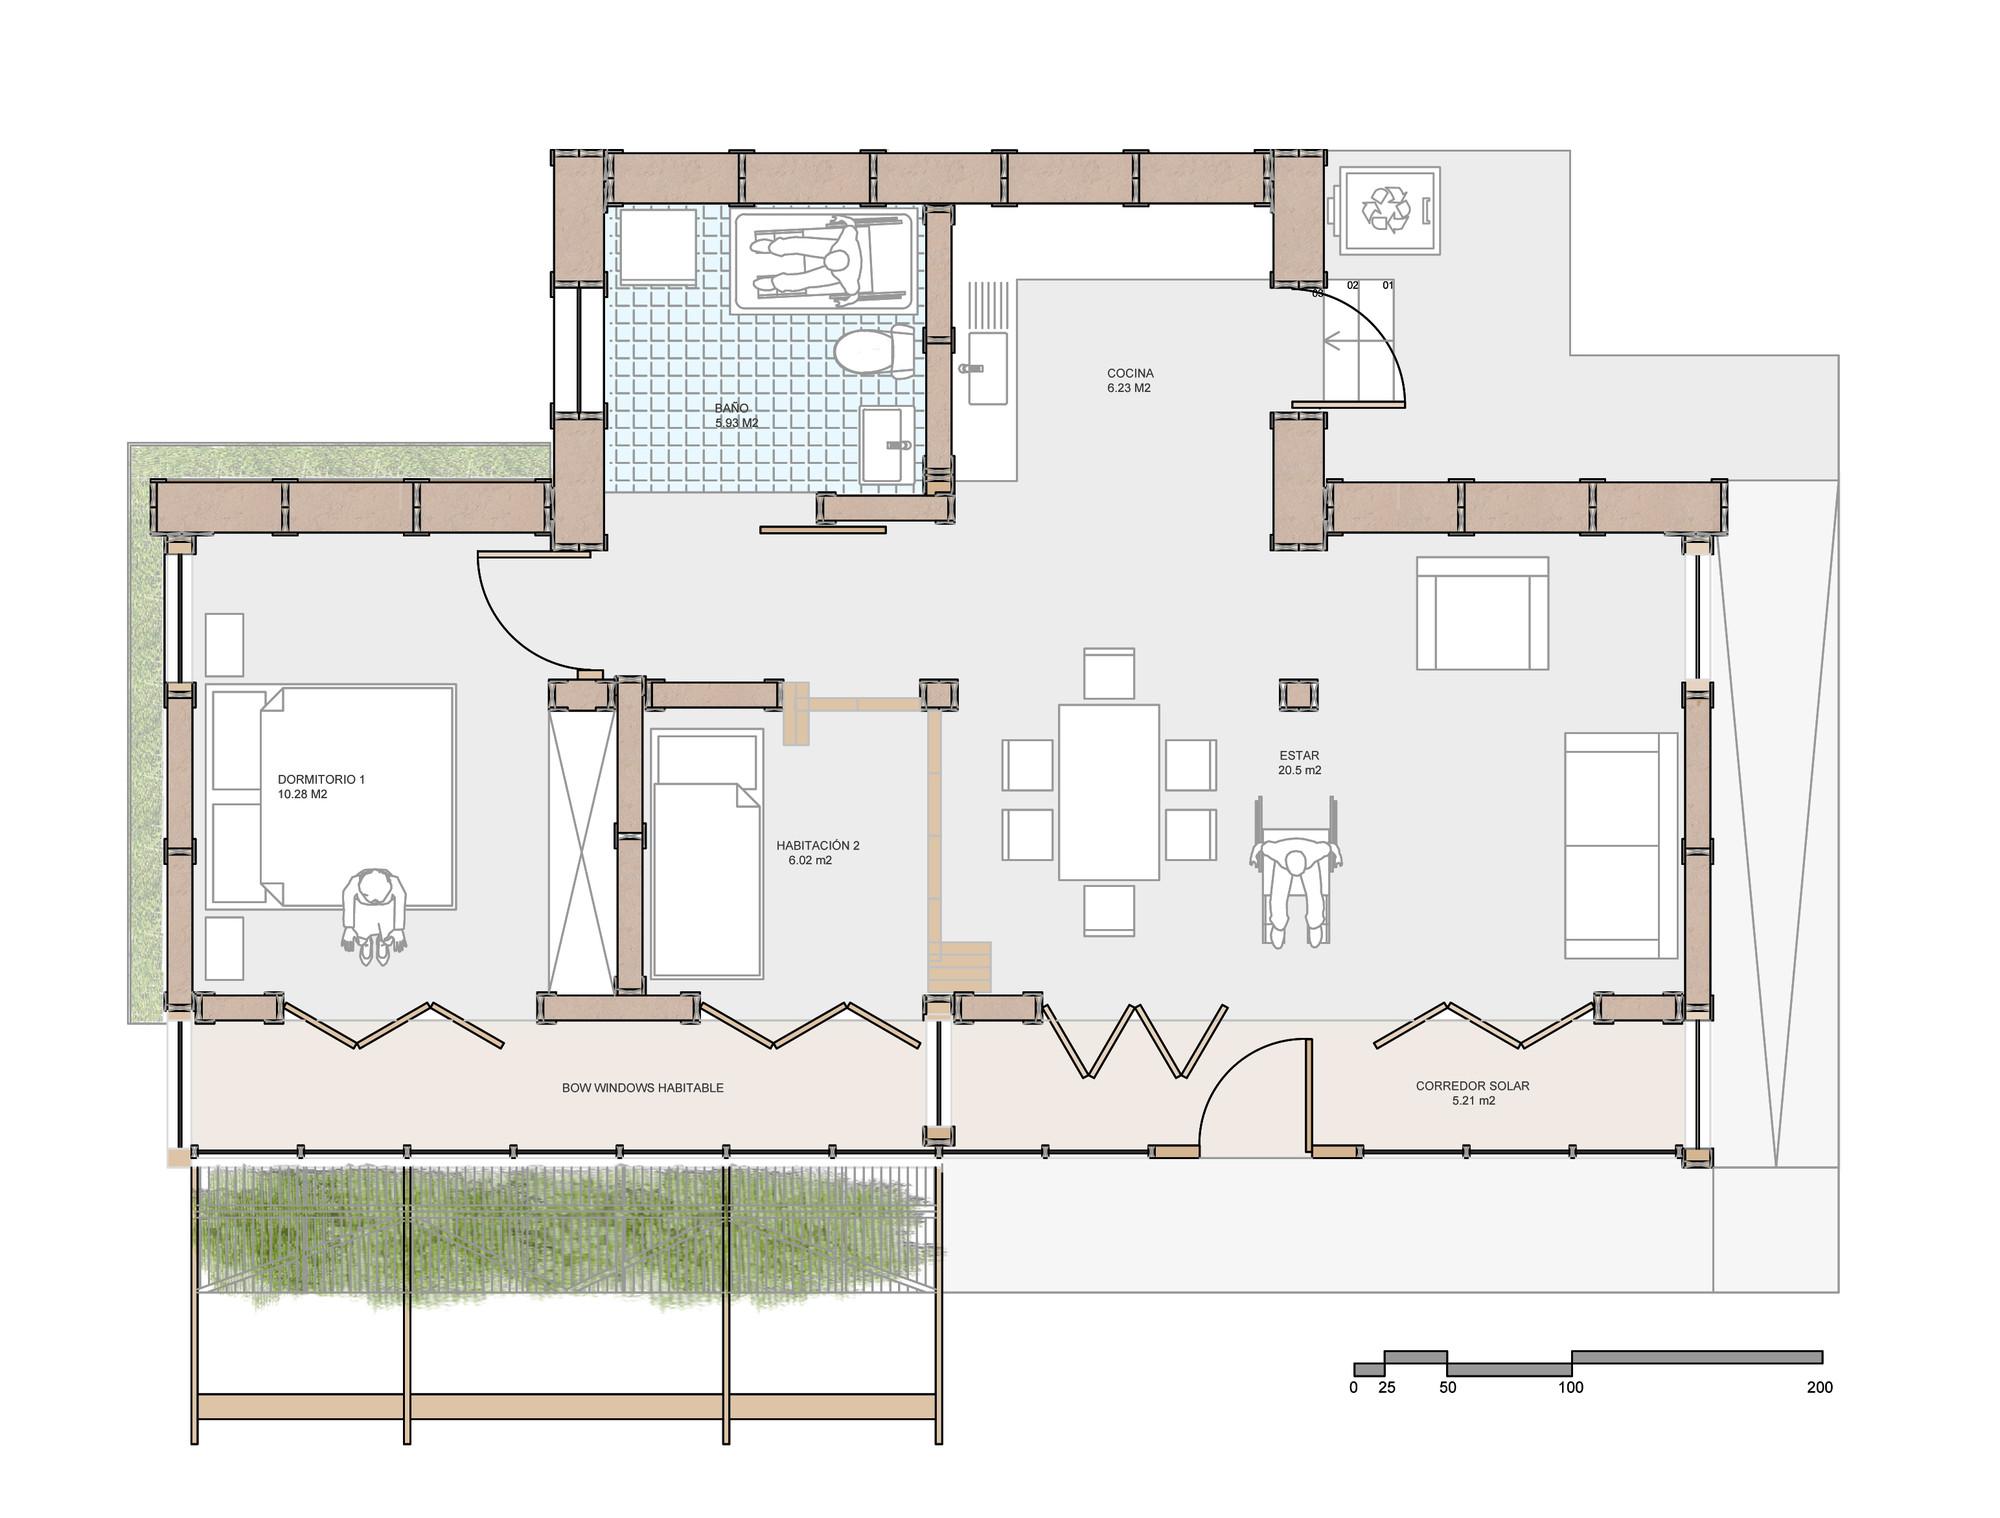 Galer a de construye solar casa made prototipo de for Cocina definicion arquitectura